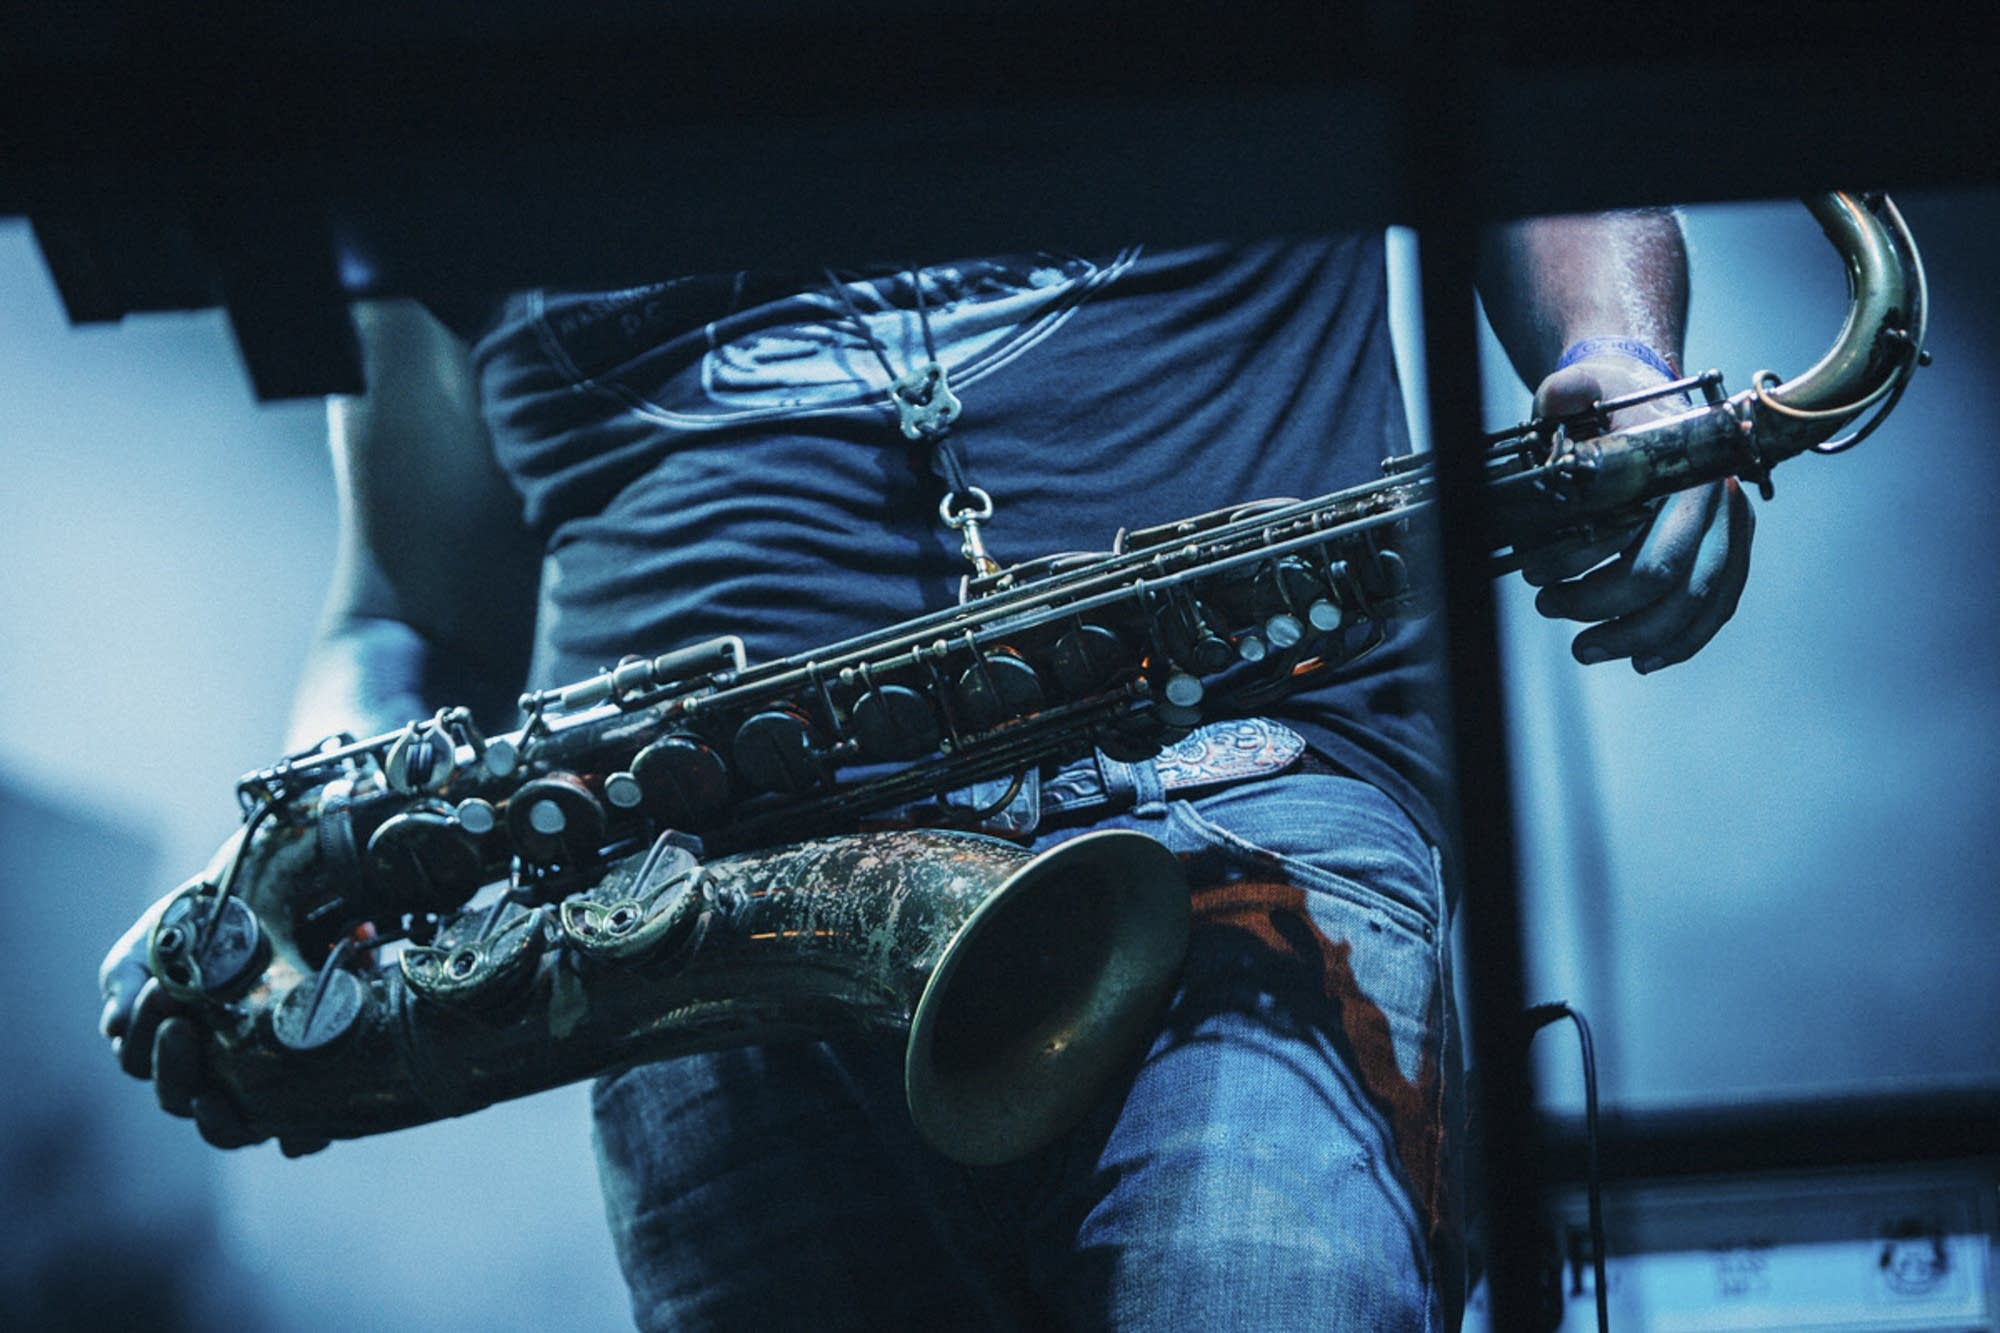 One of Bon Iver's saxophones.